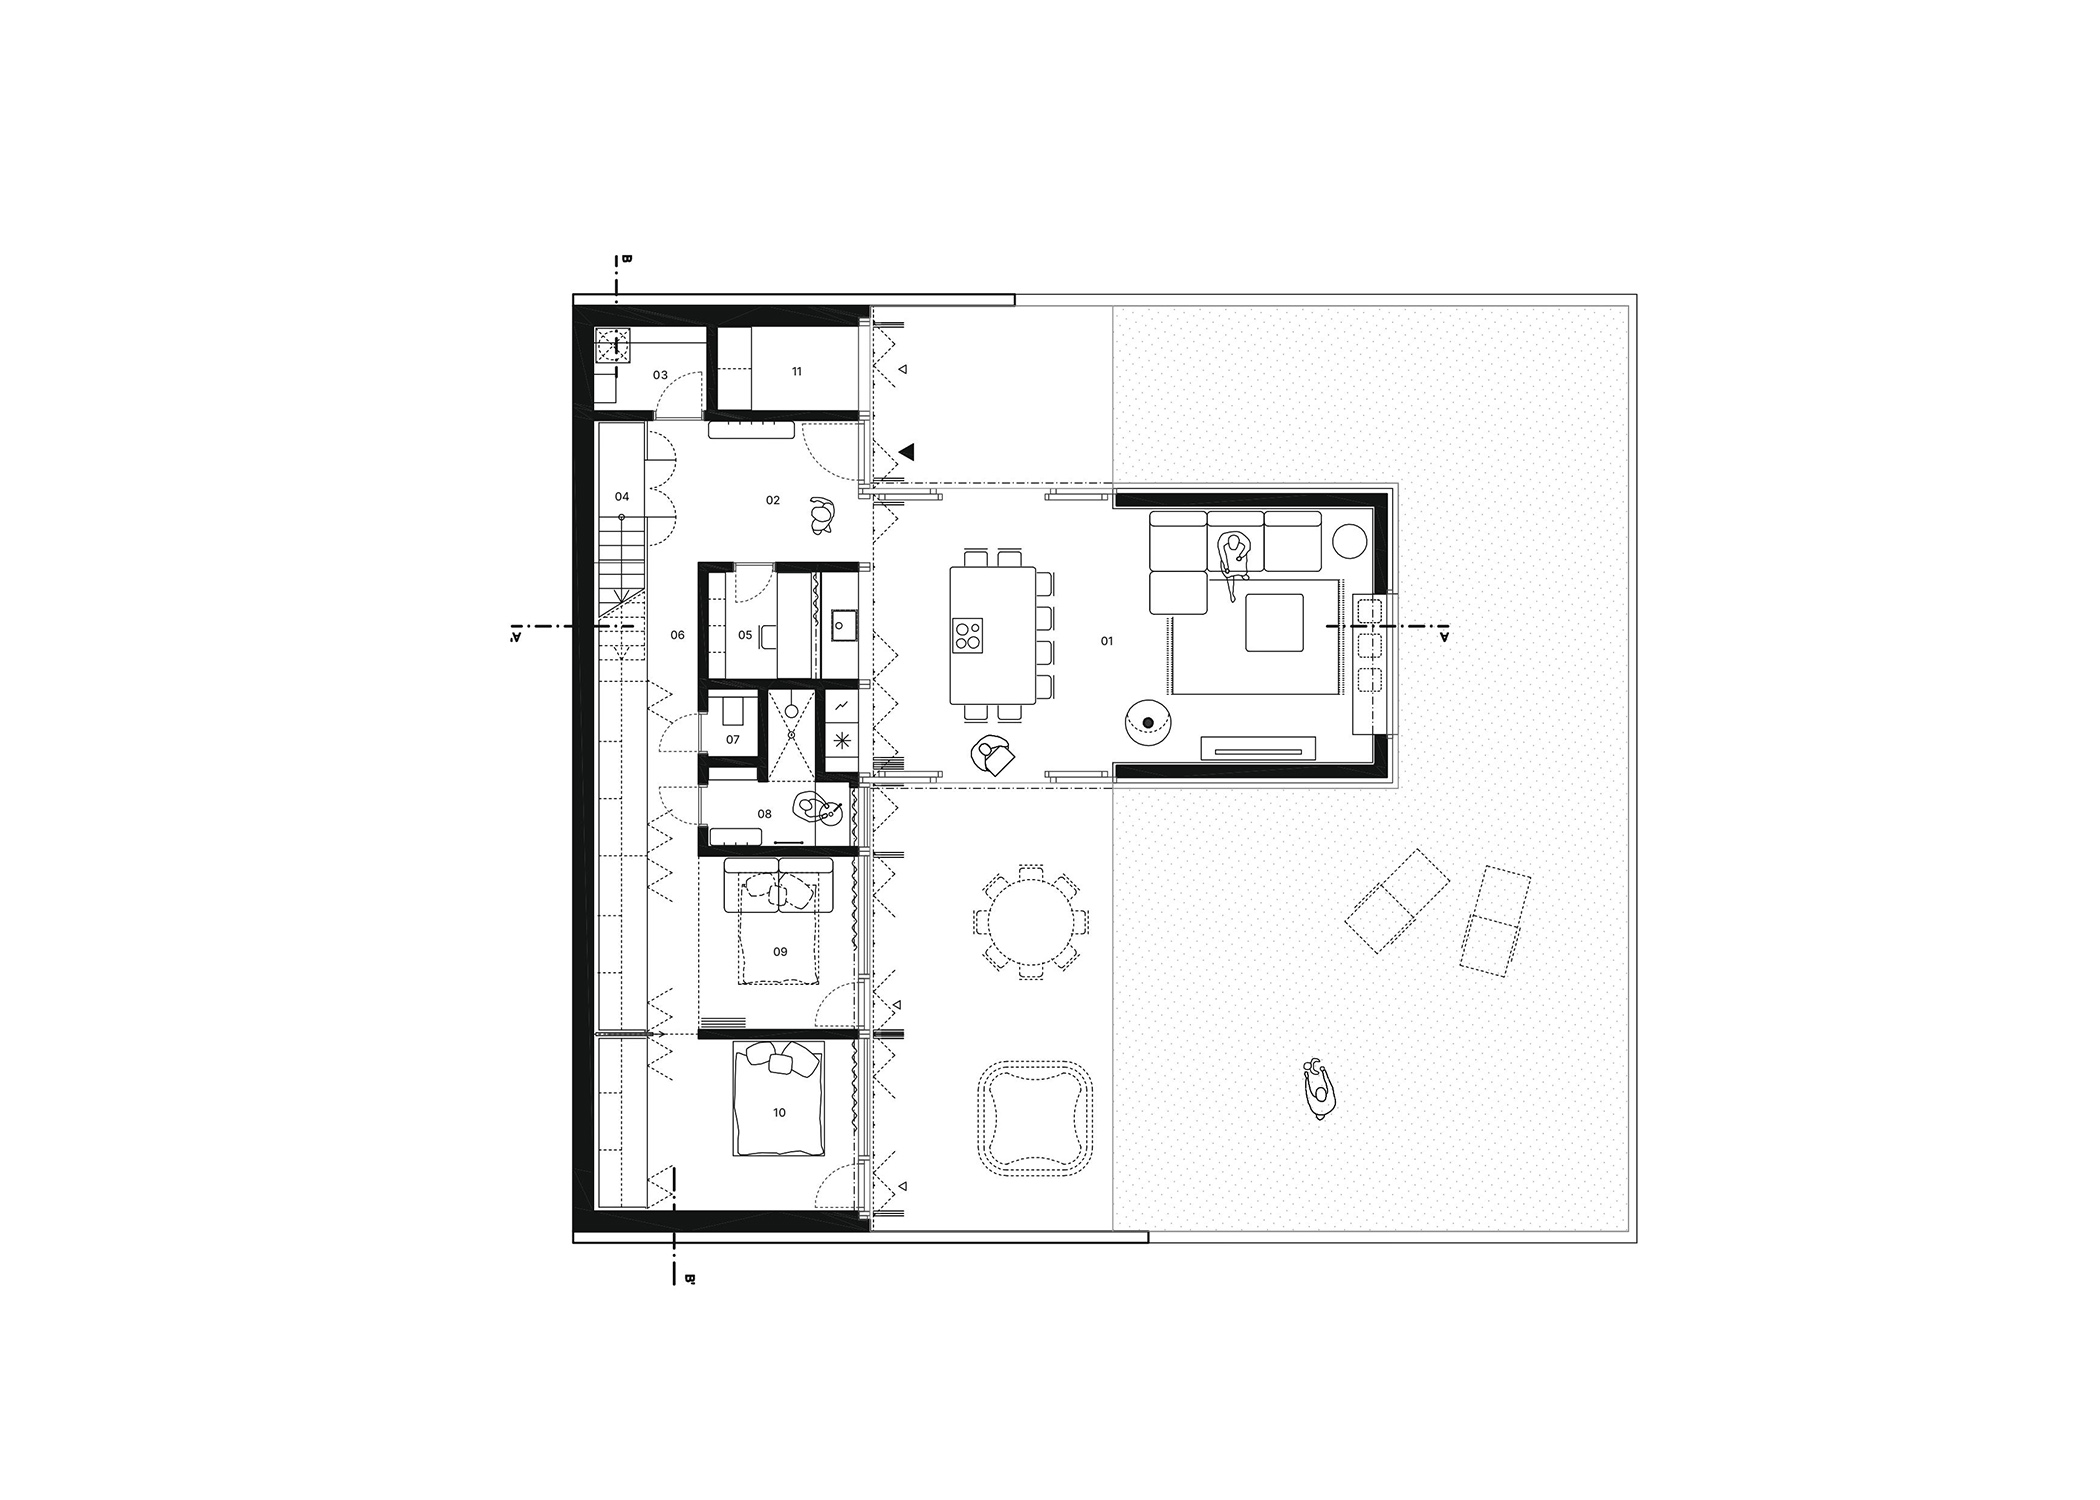 noiz-architekti-bratislava-vikendovy-dom-lozorno-07